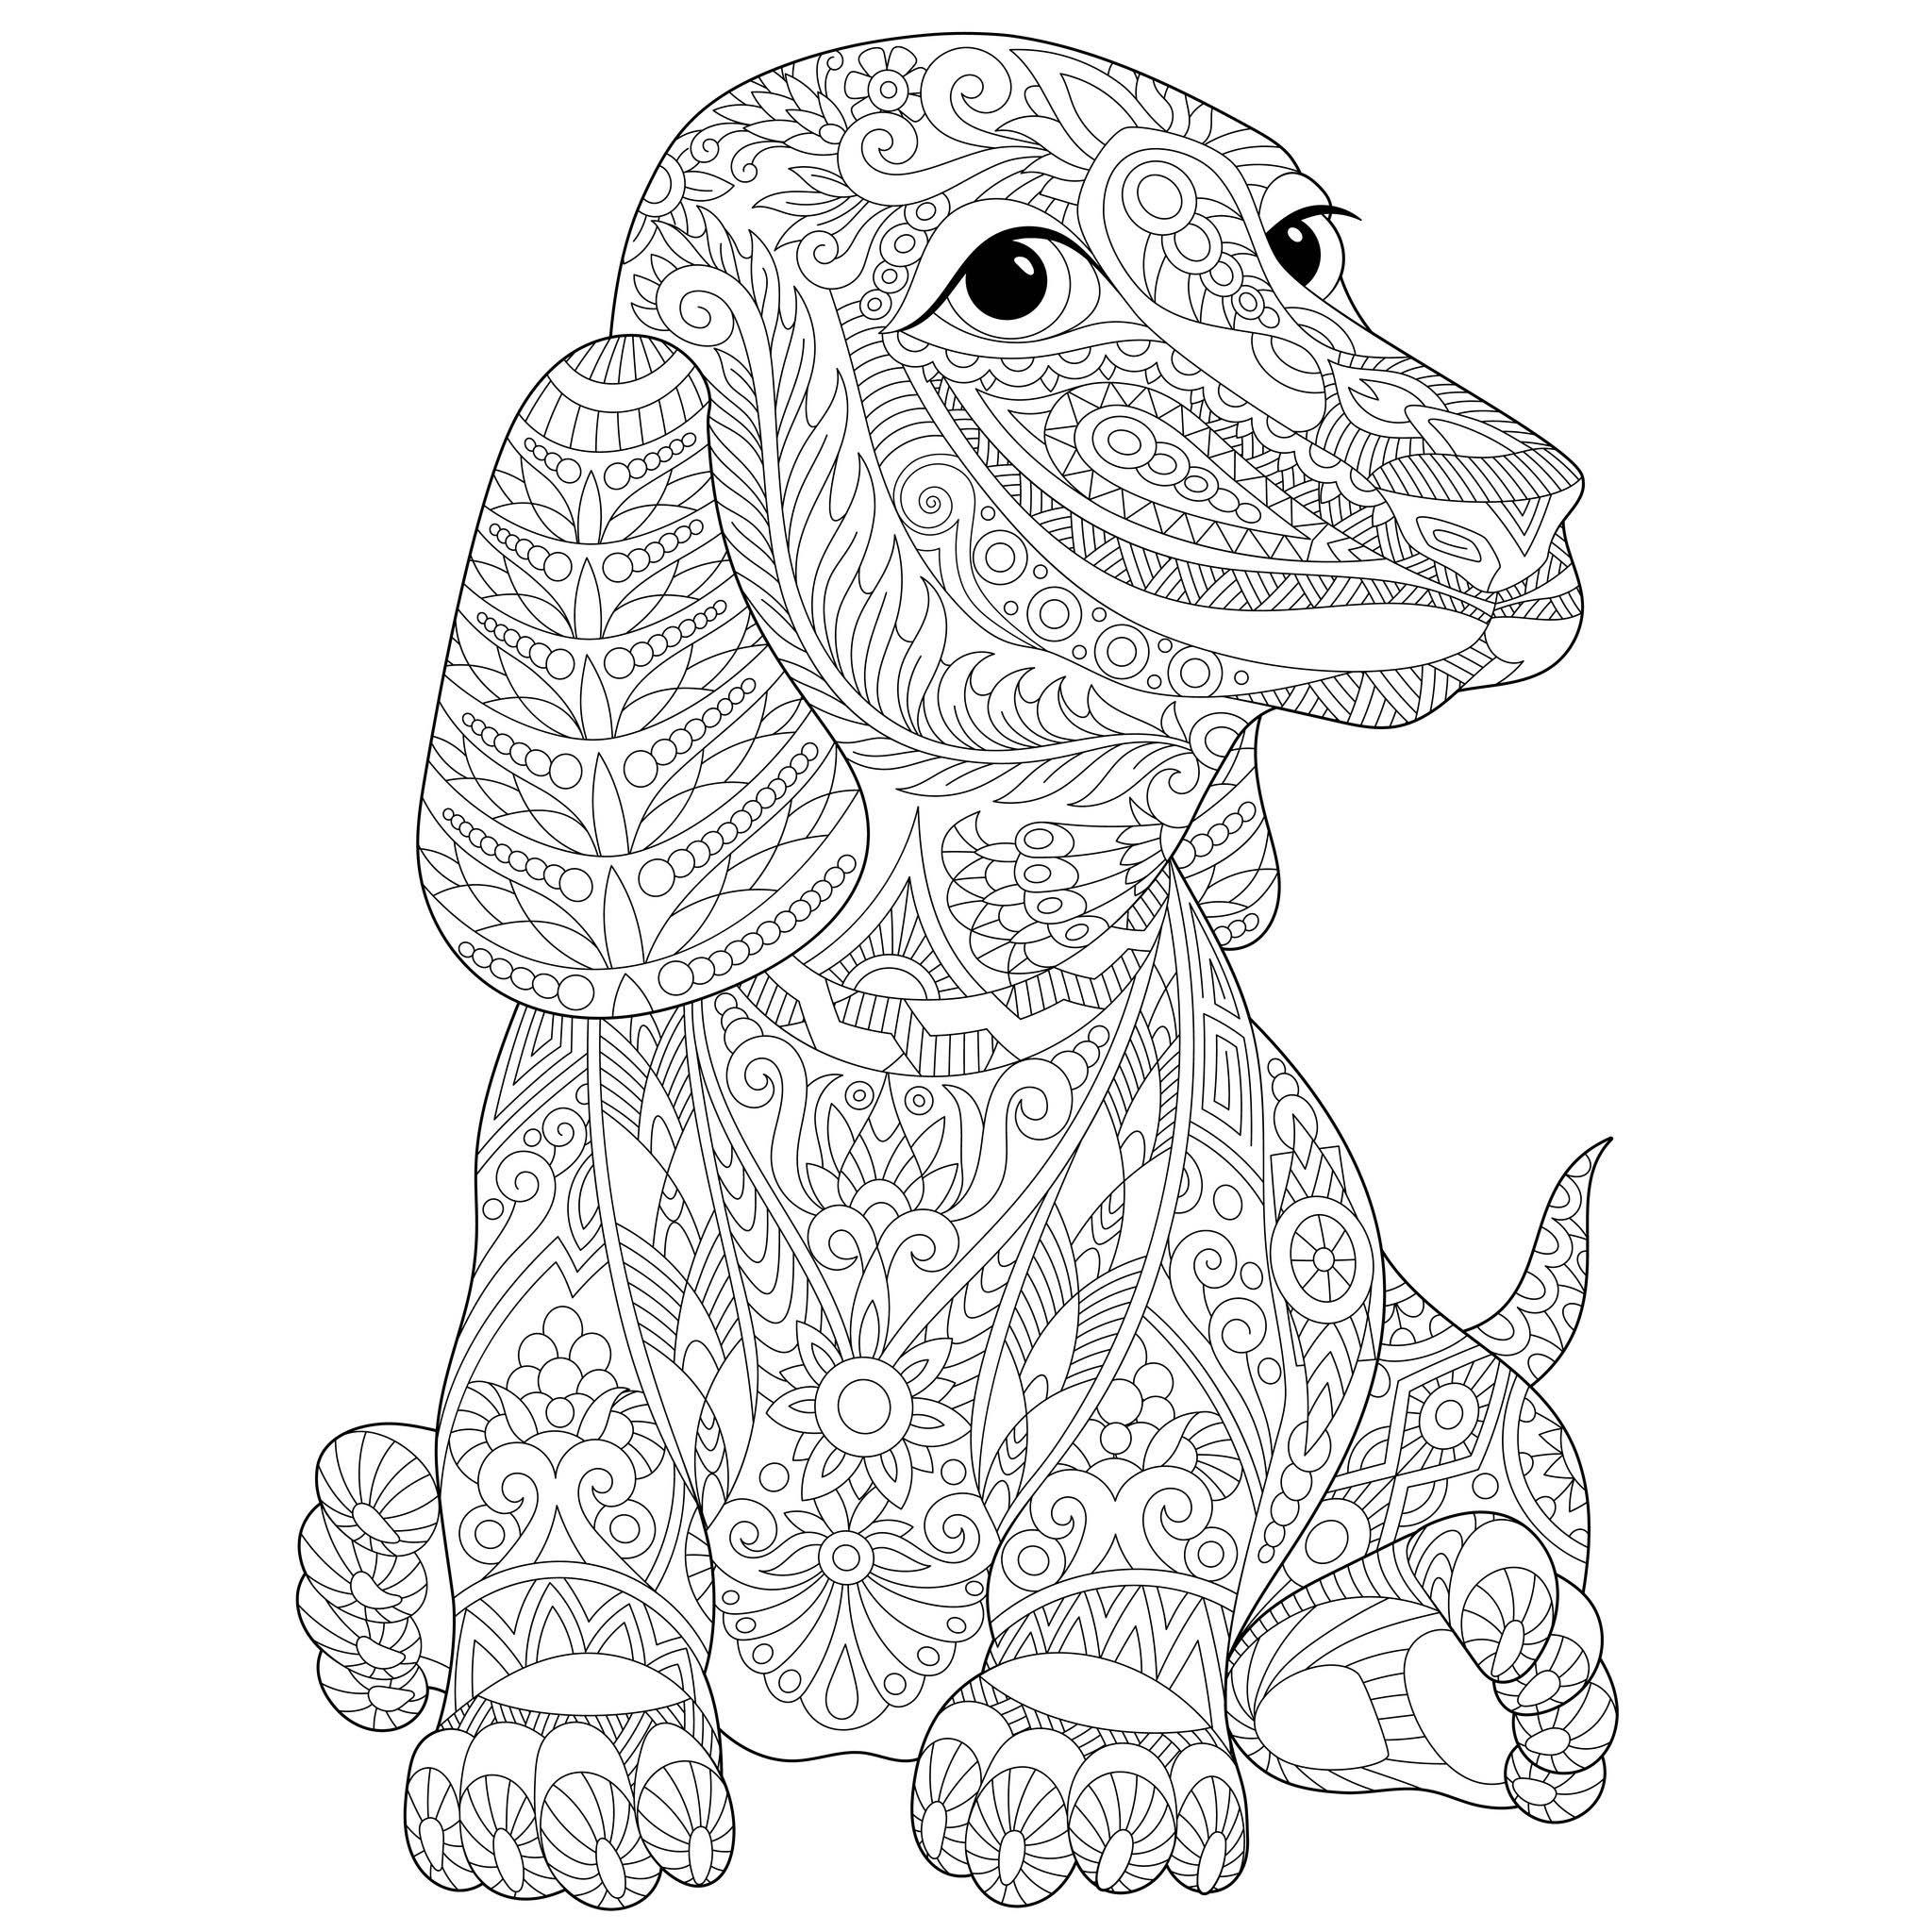 Beau dessin a imprimer chien teckel - Coloriage de chien boxer ...